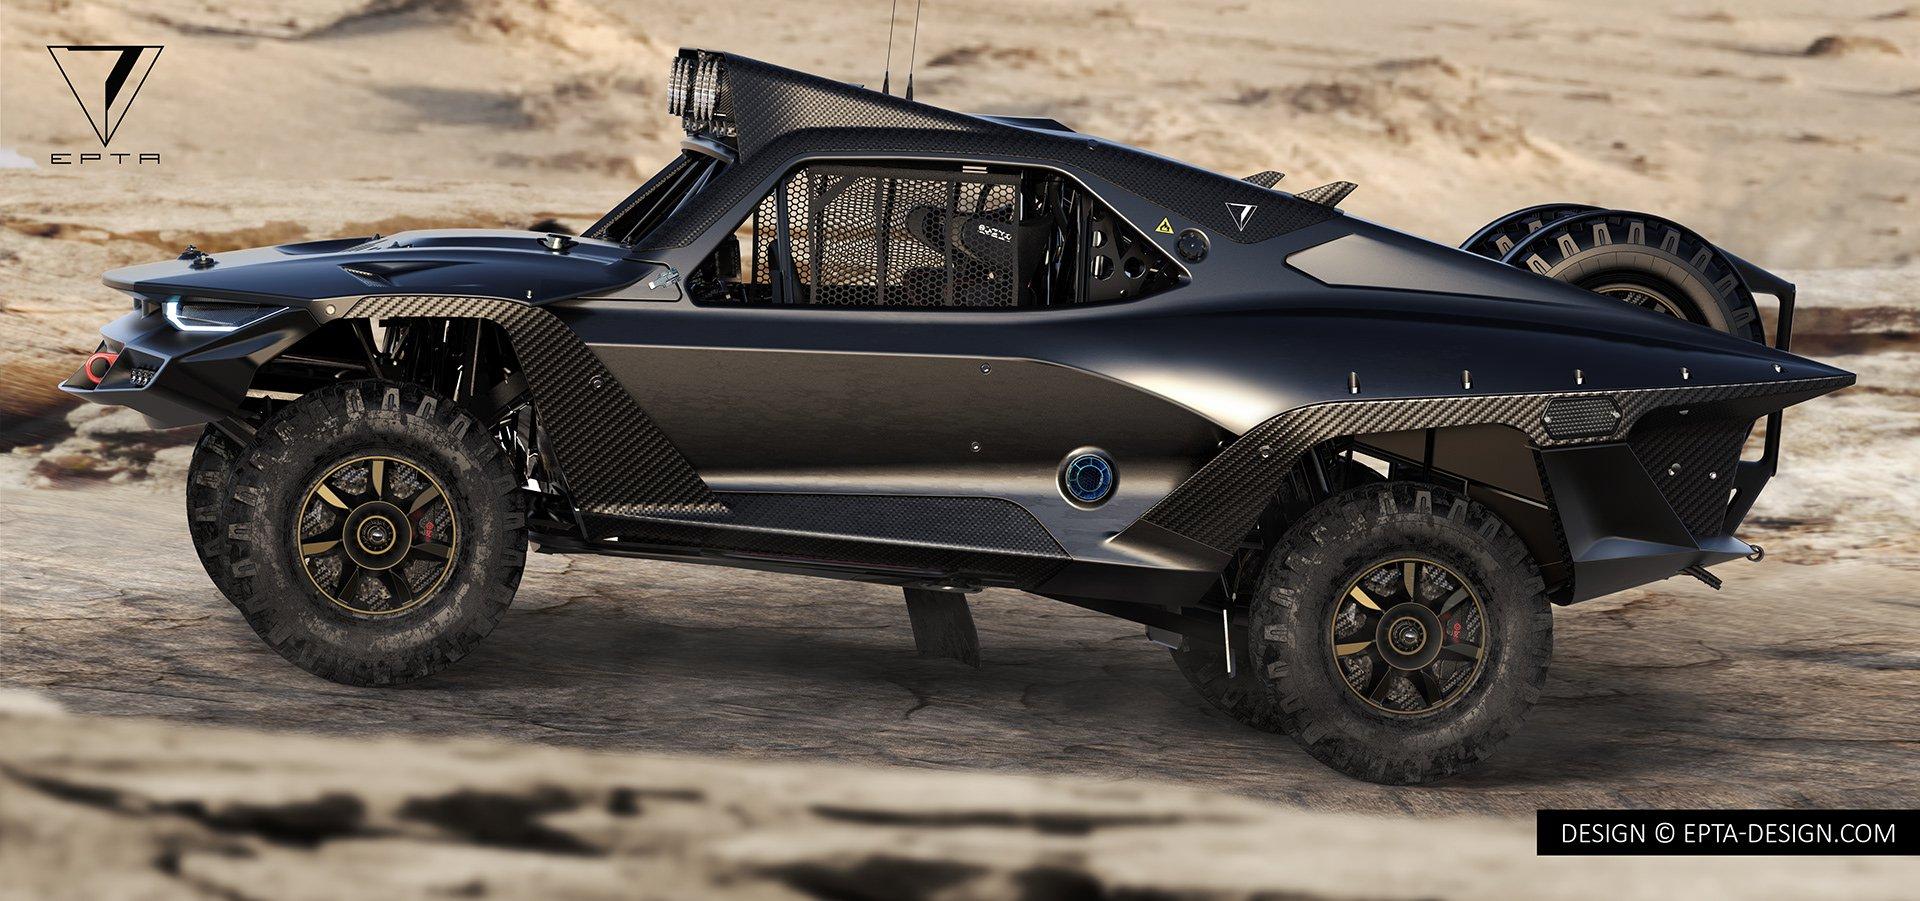 Desert Storm Trophy Truck ala EPTA Design